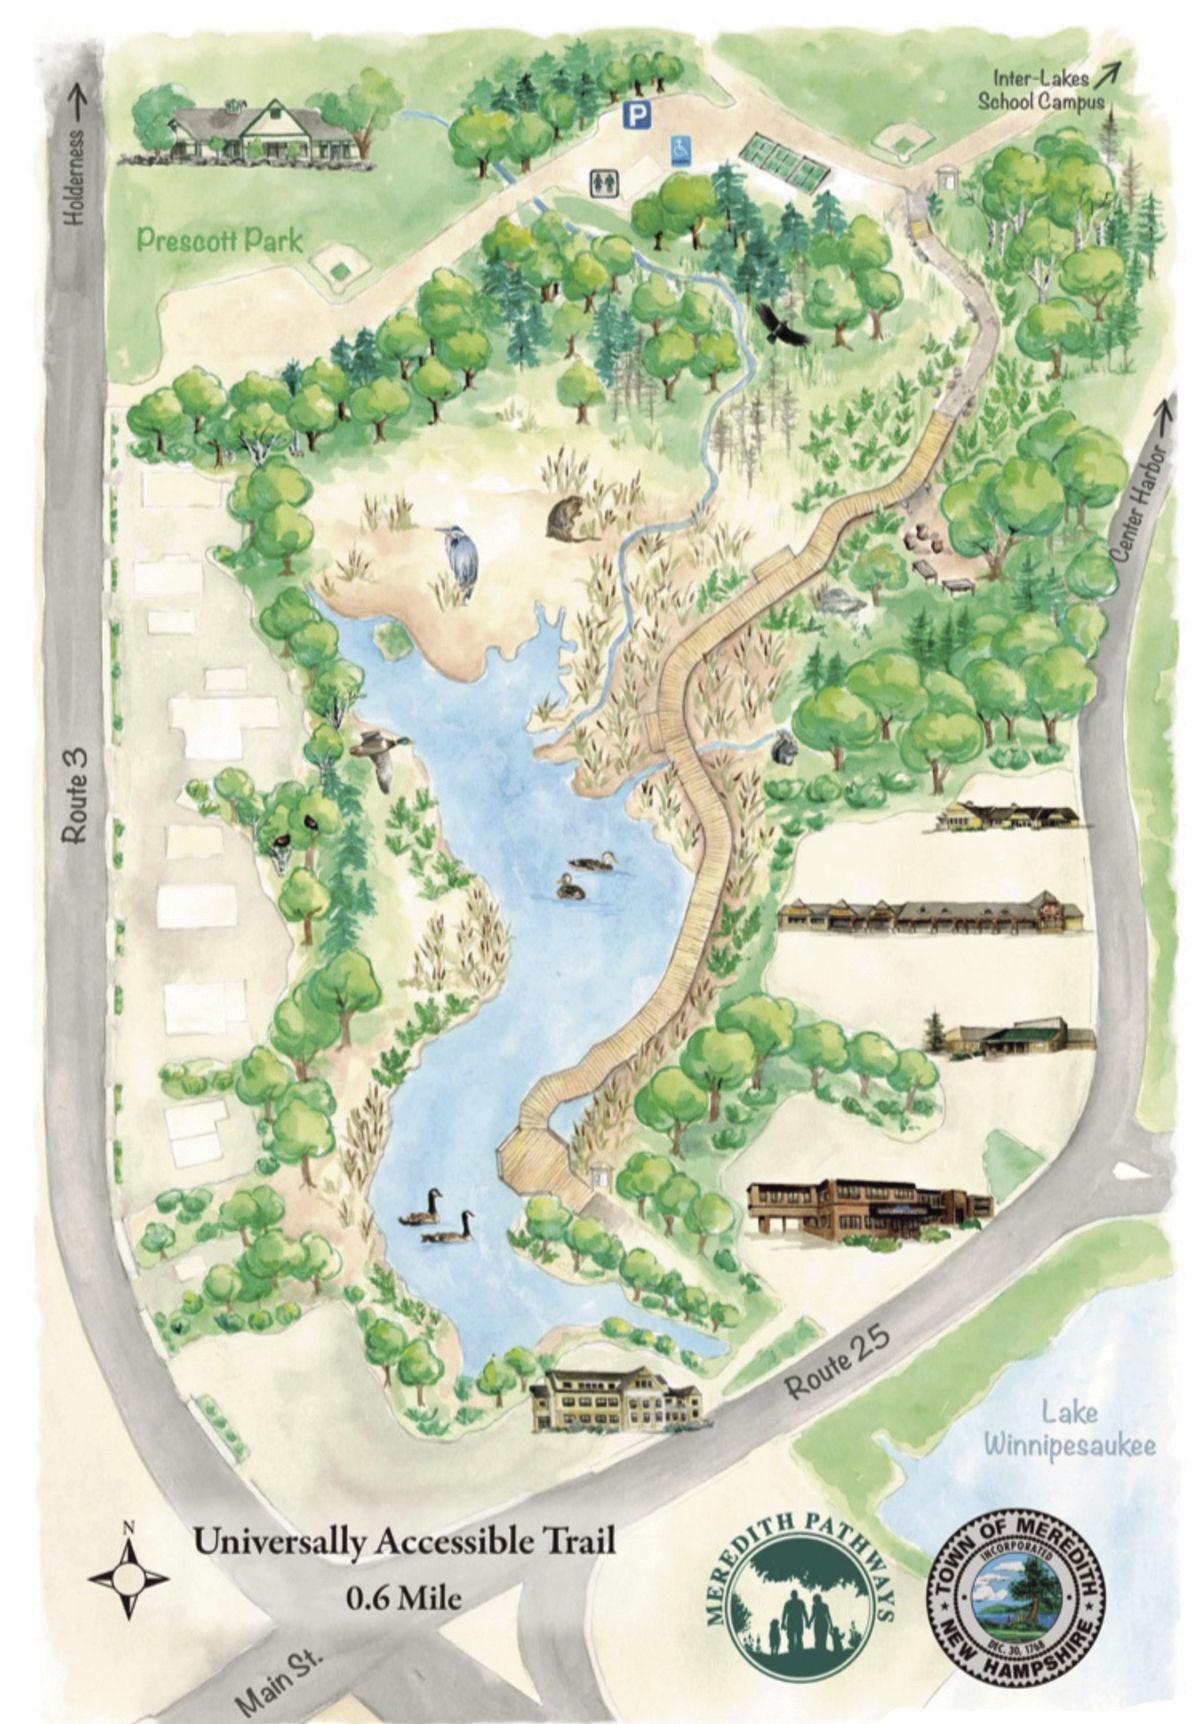 Laverack Nature Trail - Steinwachs Kiosk